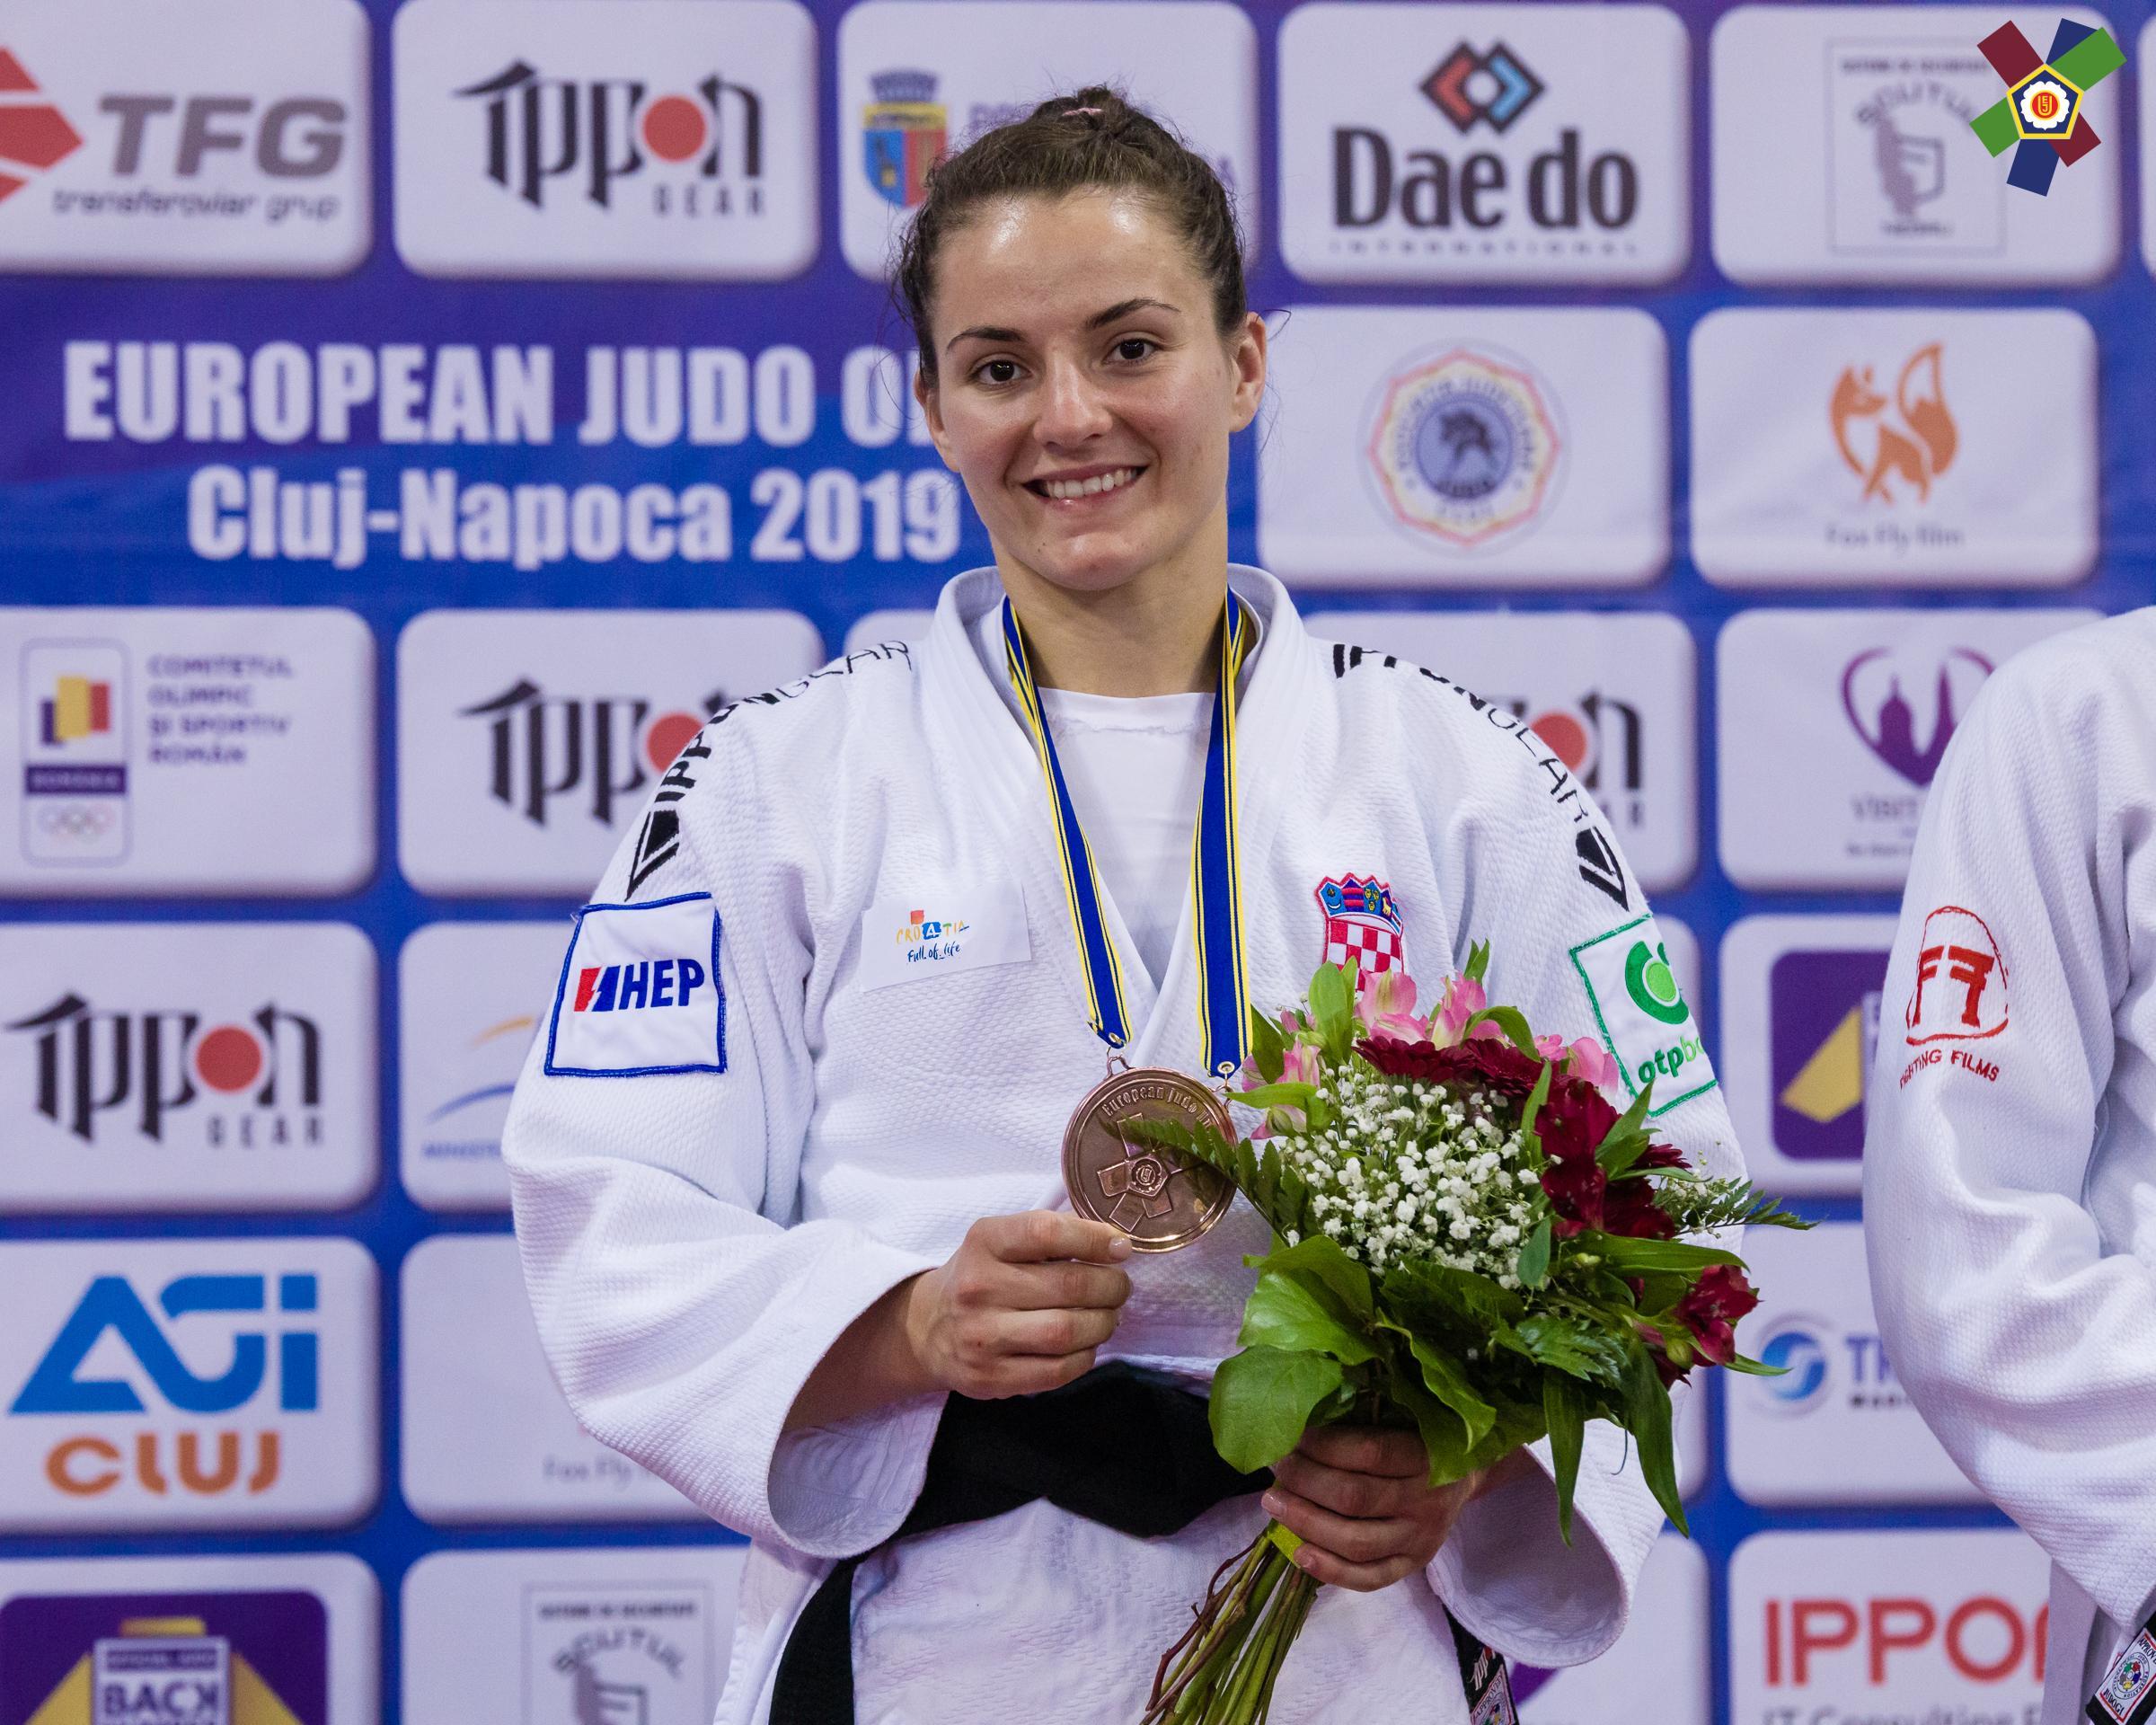 Judo-European-Open-Cluj-Napoca-2019-MATIC-Barbara-2